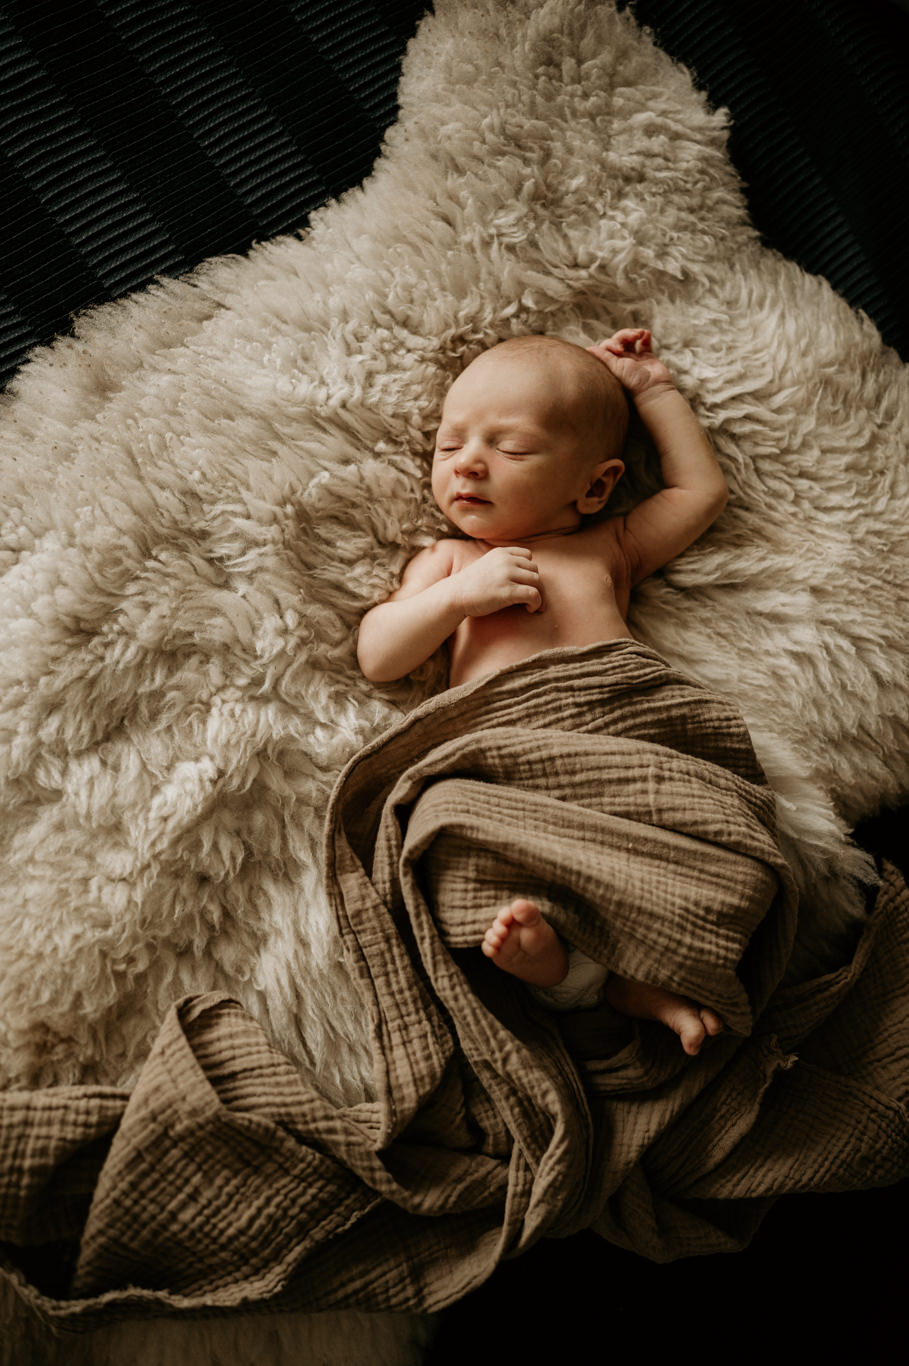 Babyfotograf Newborn Fotograf Mannheim Newborn Shooting Ludwigshafen Newbornfotograf Neckarstadt Babyfotografin